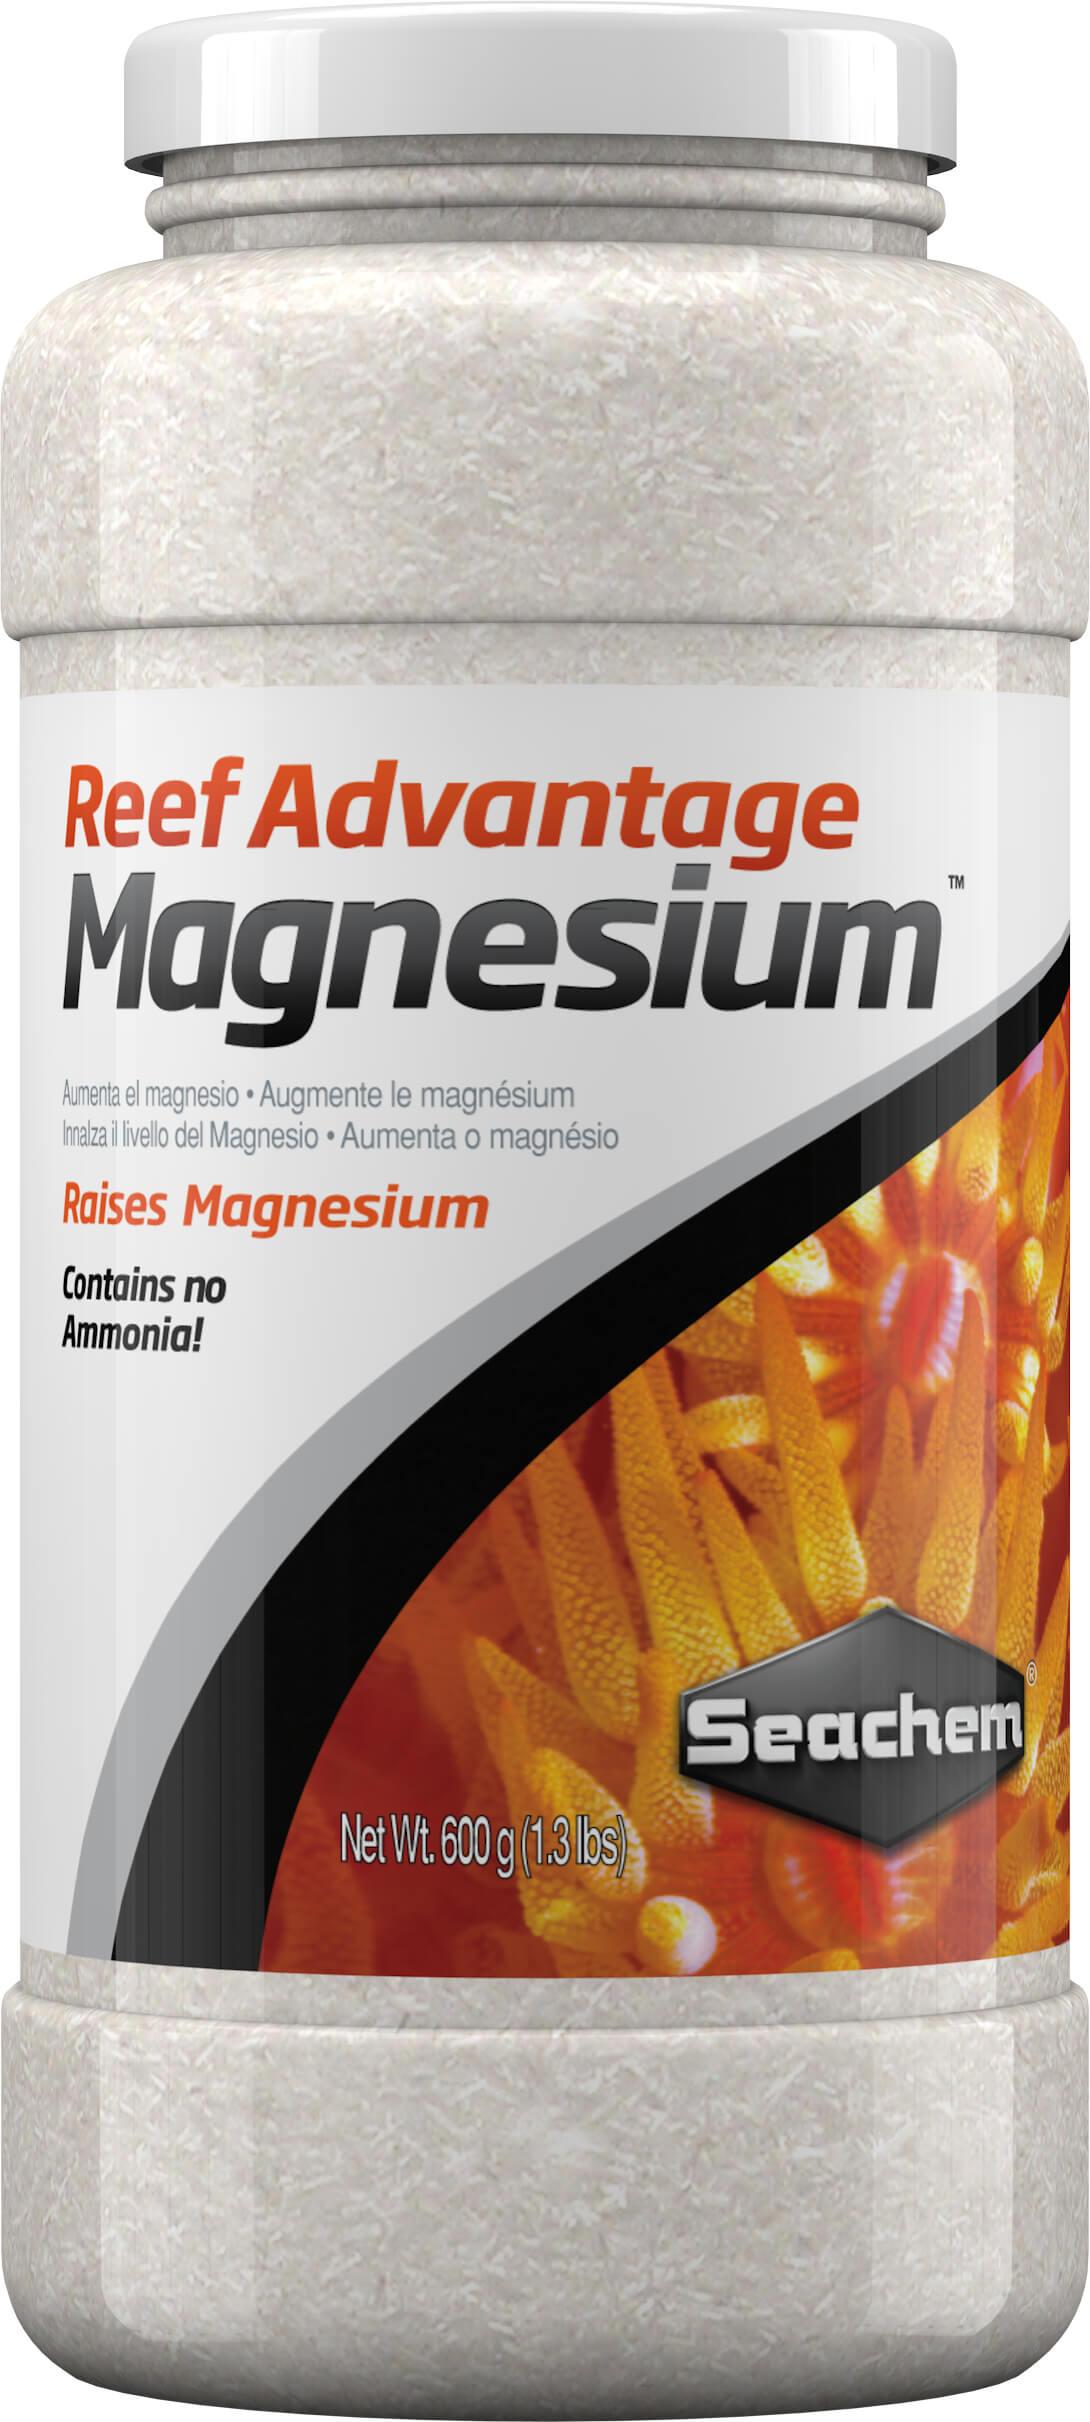 Reef ADV Magnesium 600grs SEACHEM